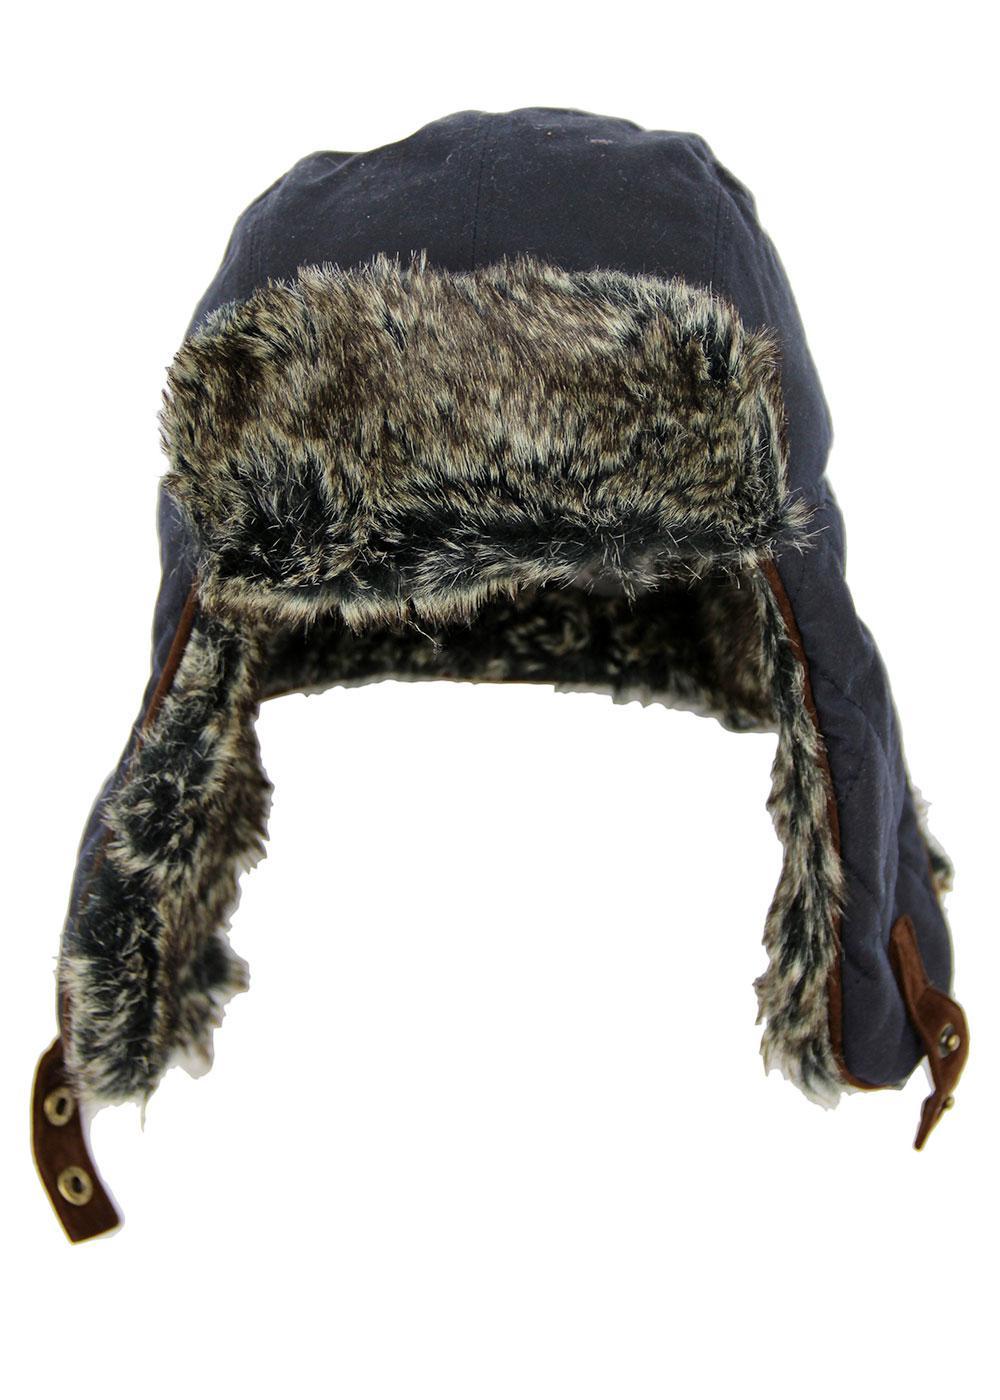 FAILSWORTH Retro Check Lined Wax Trapper Hat NAVY